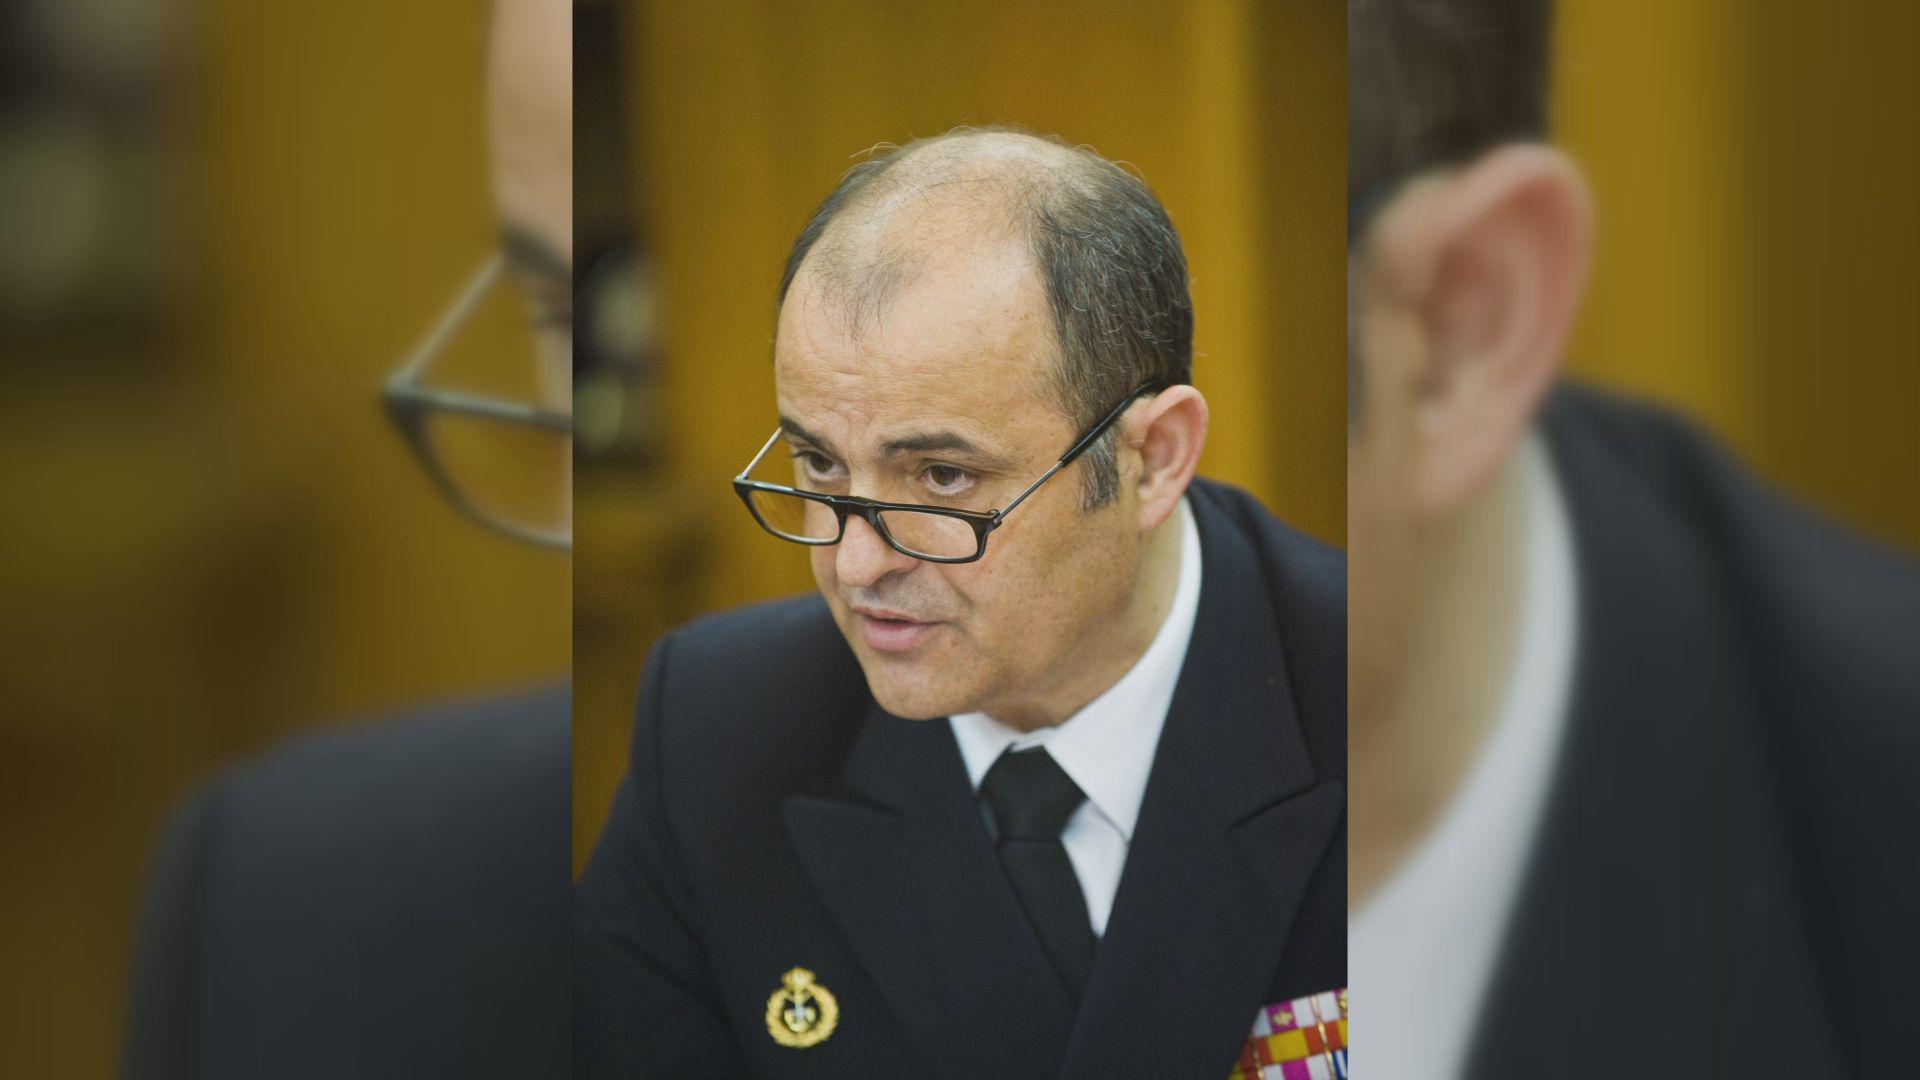 MANUEL GARAT (almirante de flota de la Armada) - tiene un patrimonio de 331.134 euros